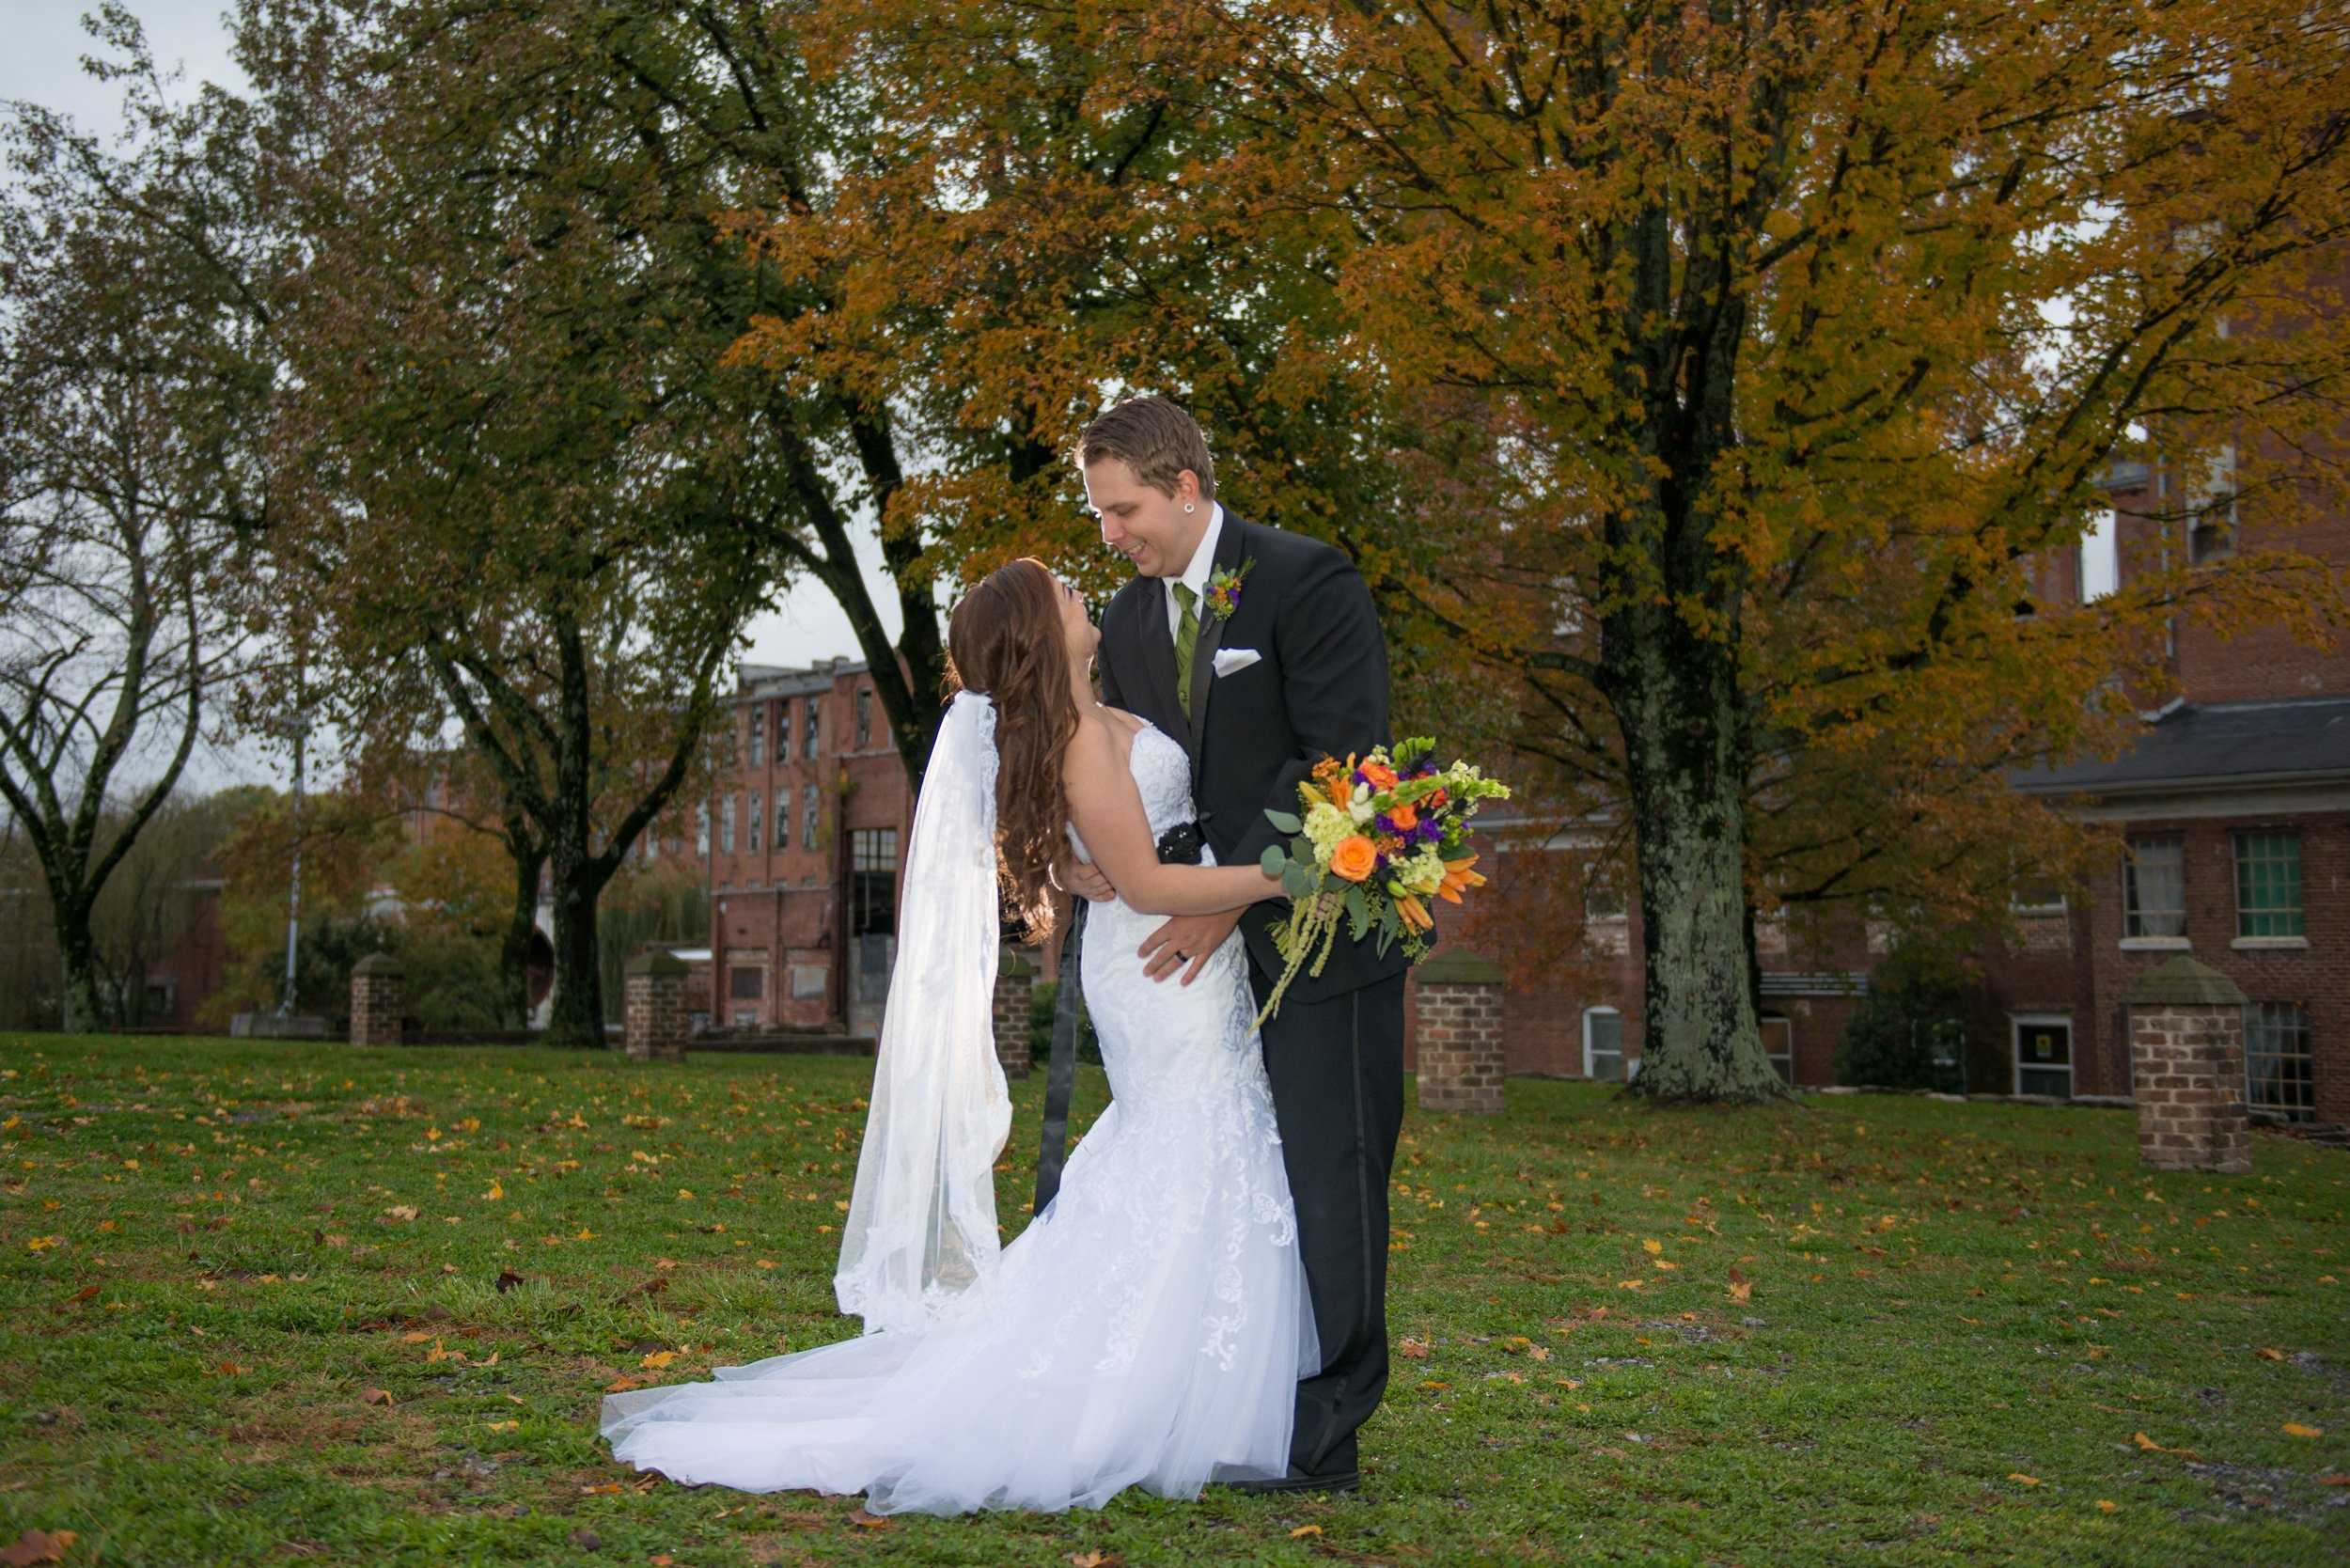 00001_Parker-Wedding-Sp-78.jpg